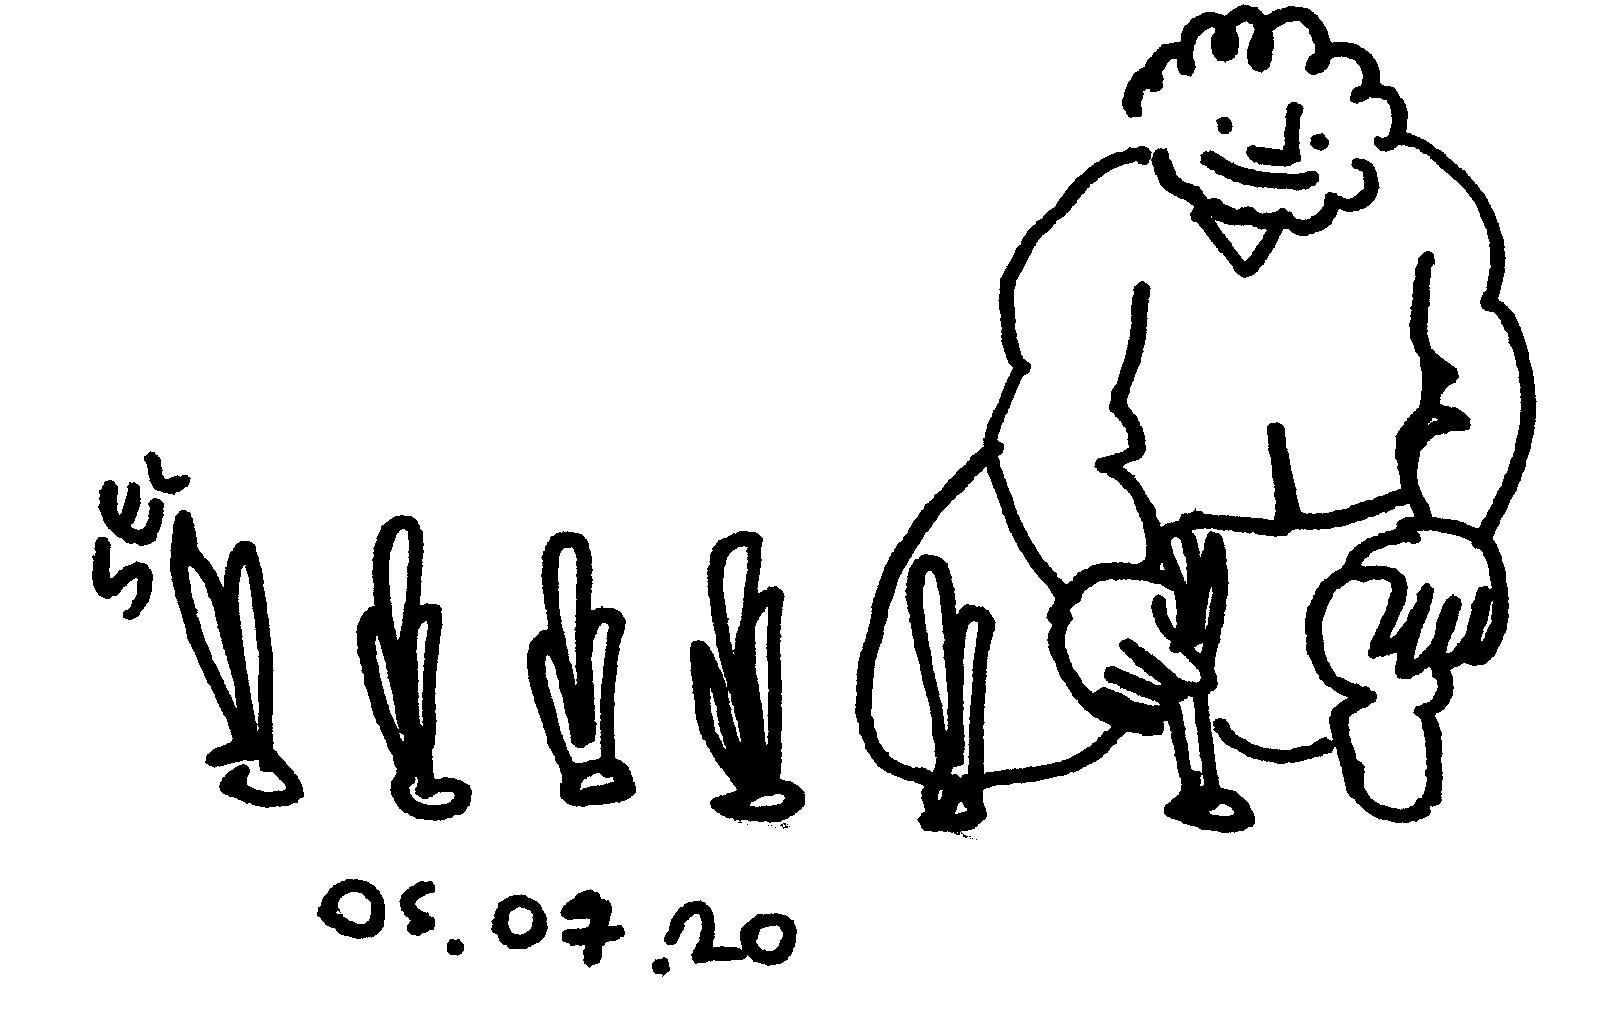 05_07_20069